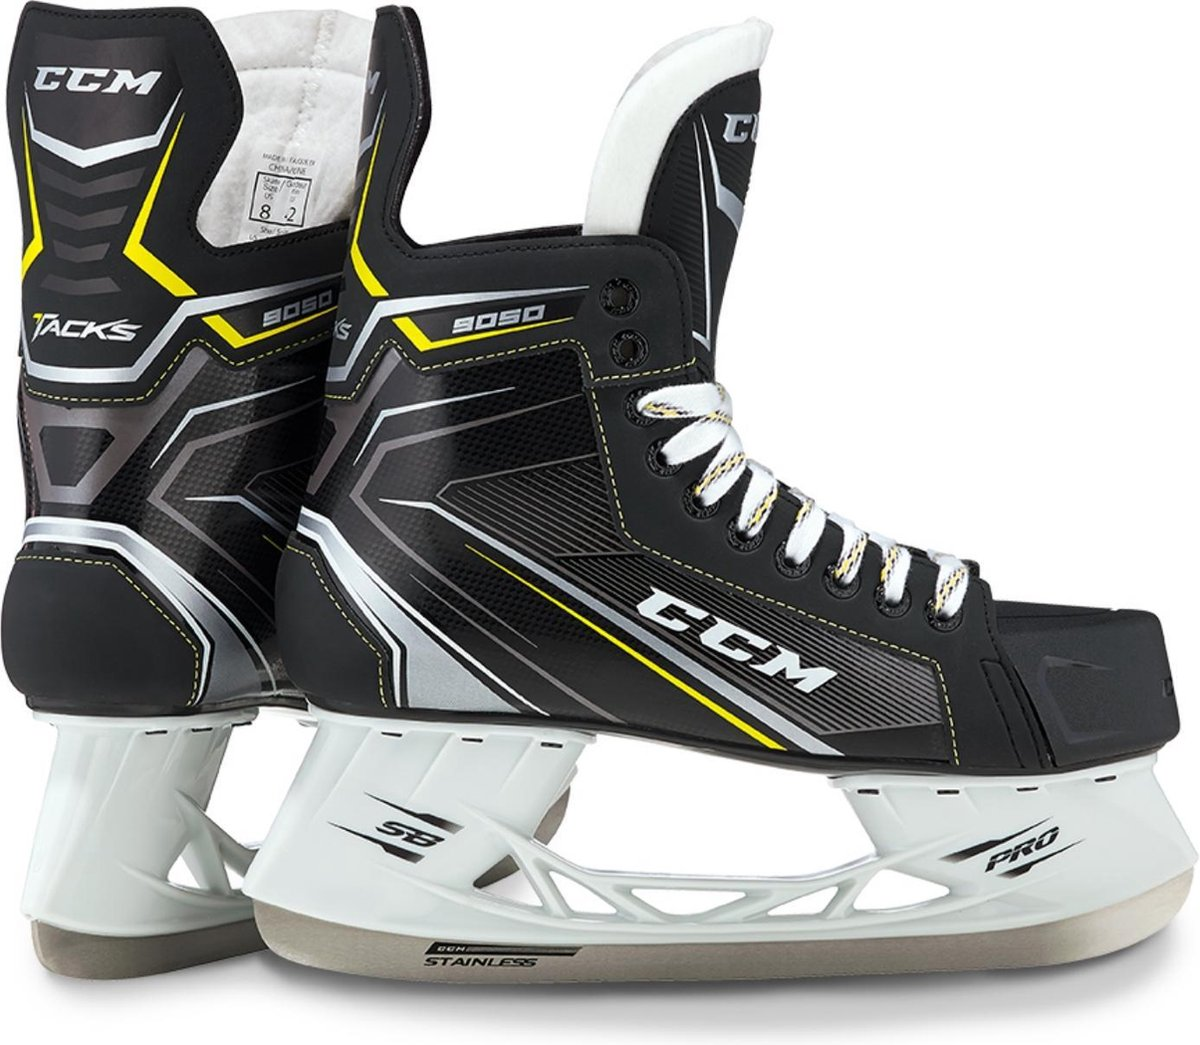 CCM IJshockeyschaatsen TACKS 9050 SR Zwart 47